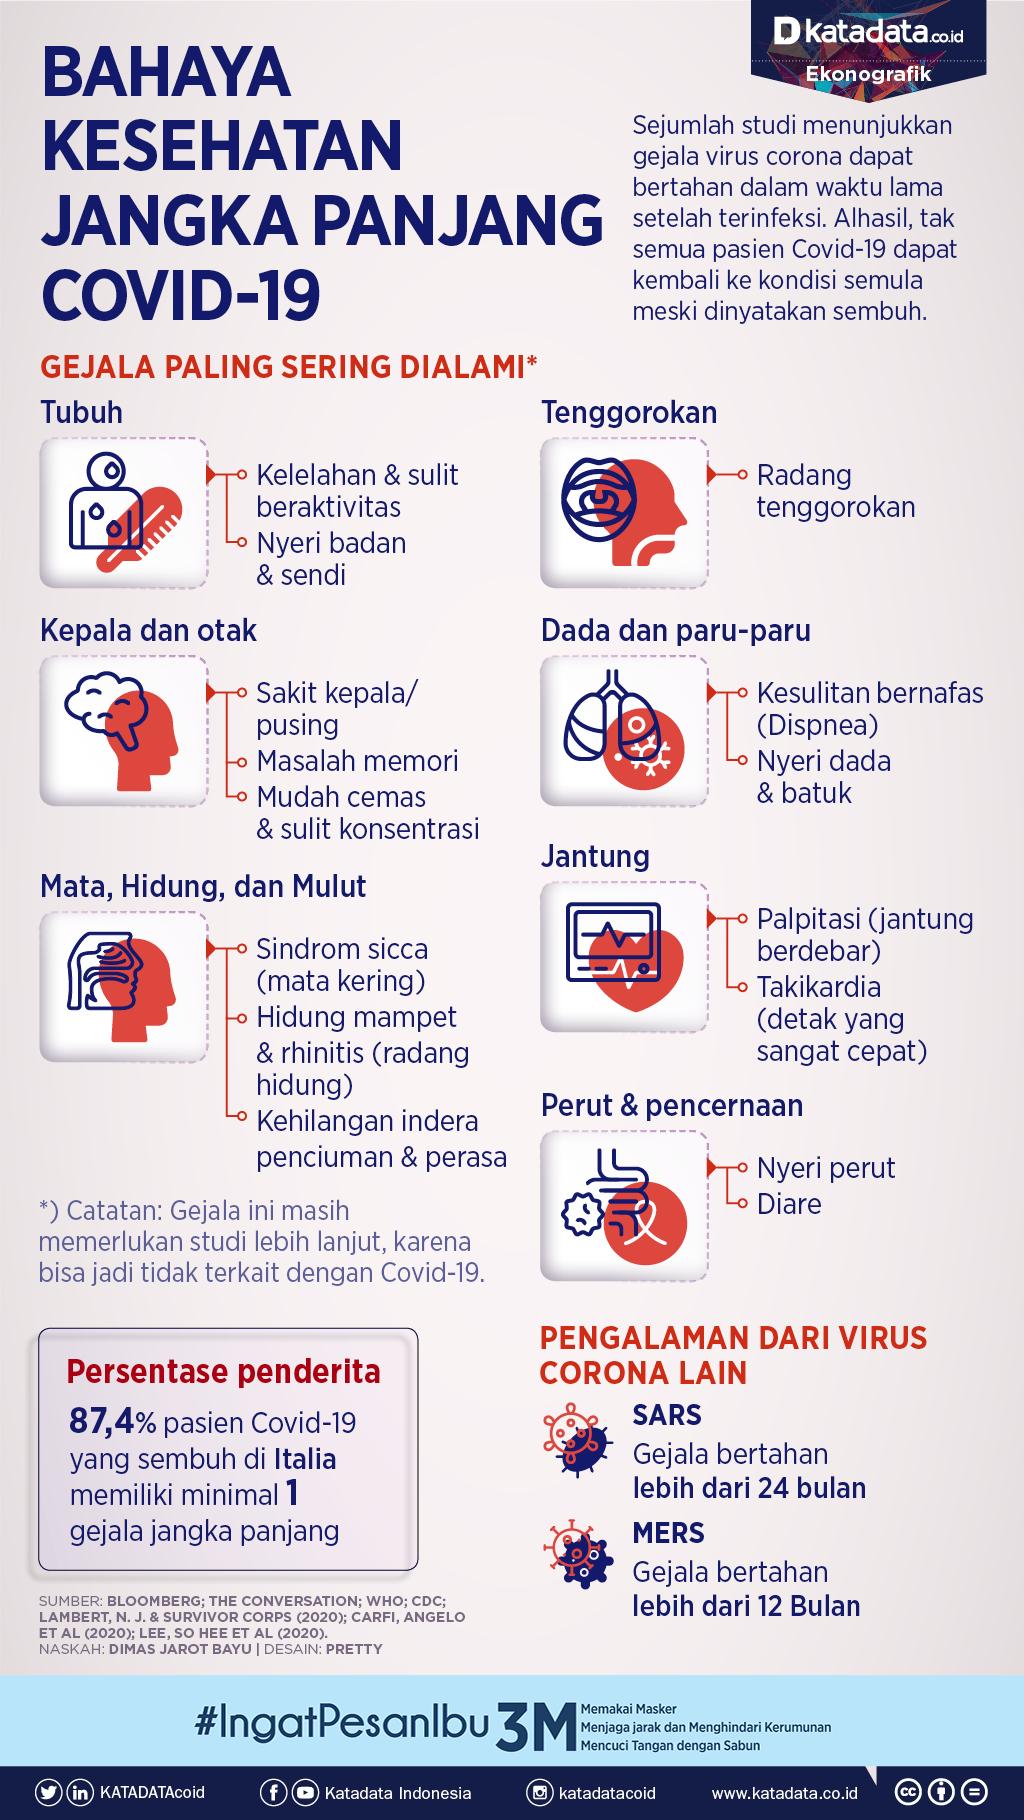 Dampak kesehatan jangka panjang covid-19